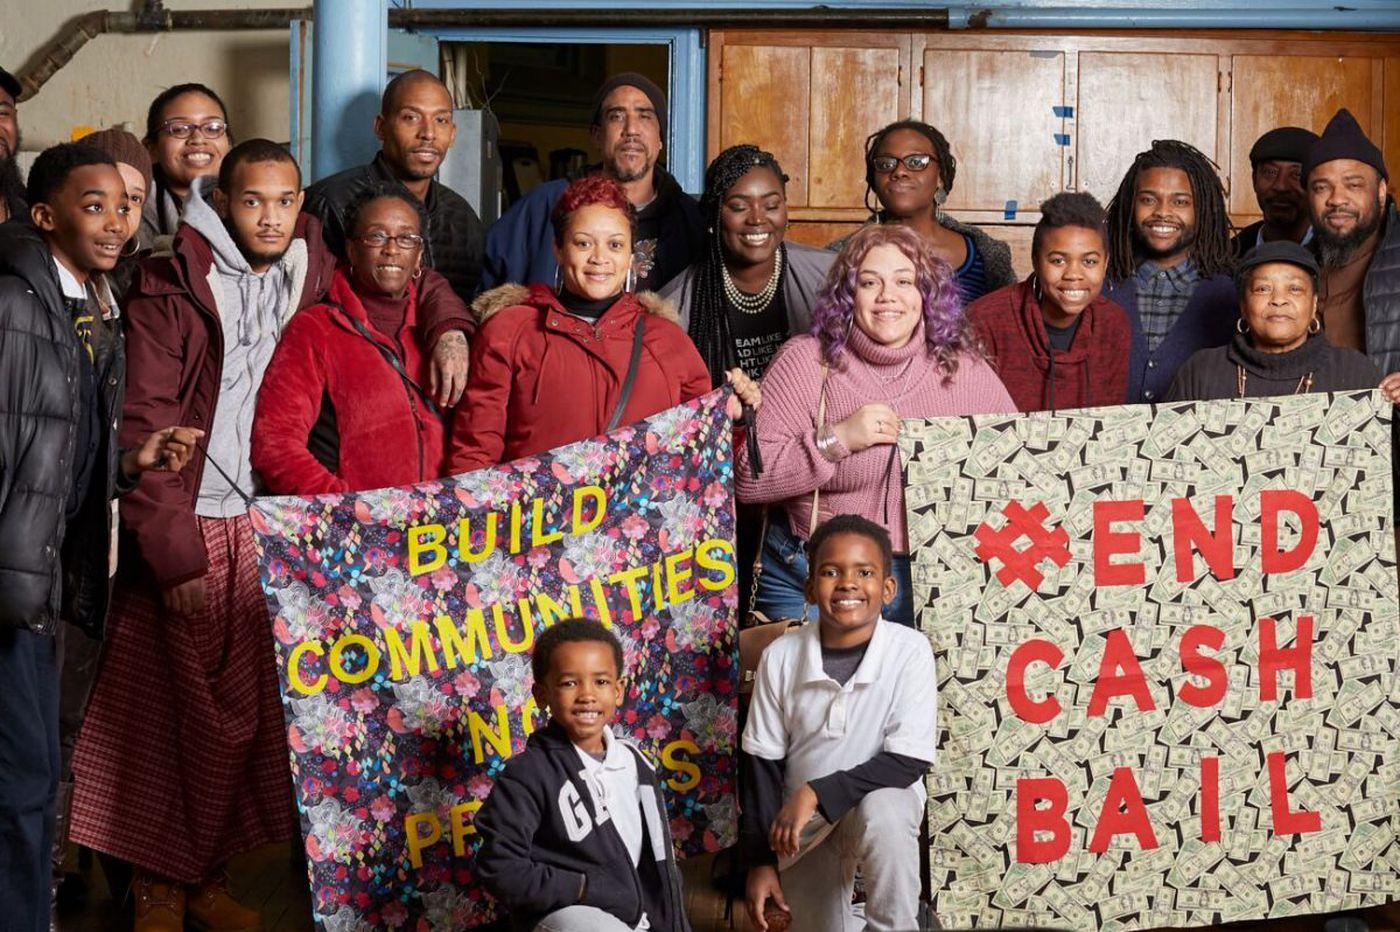 #FreeBlackMamas: Cash bail hurts communities of color, but especially black women   Opinion